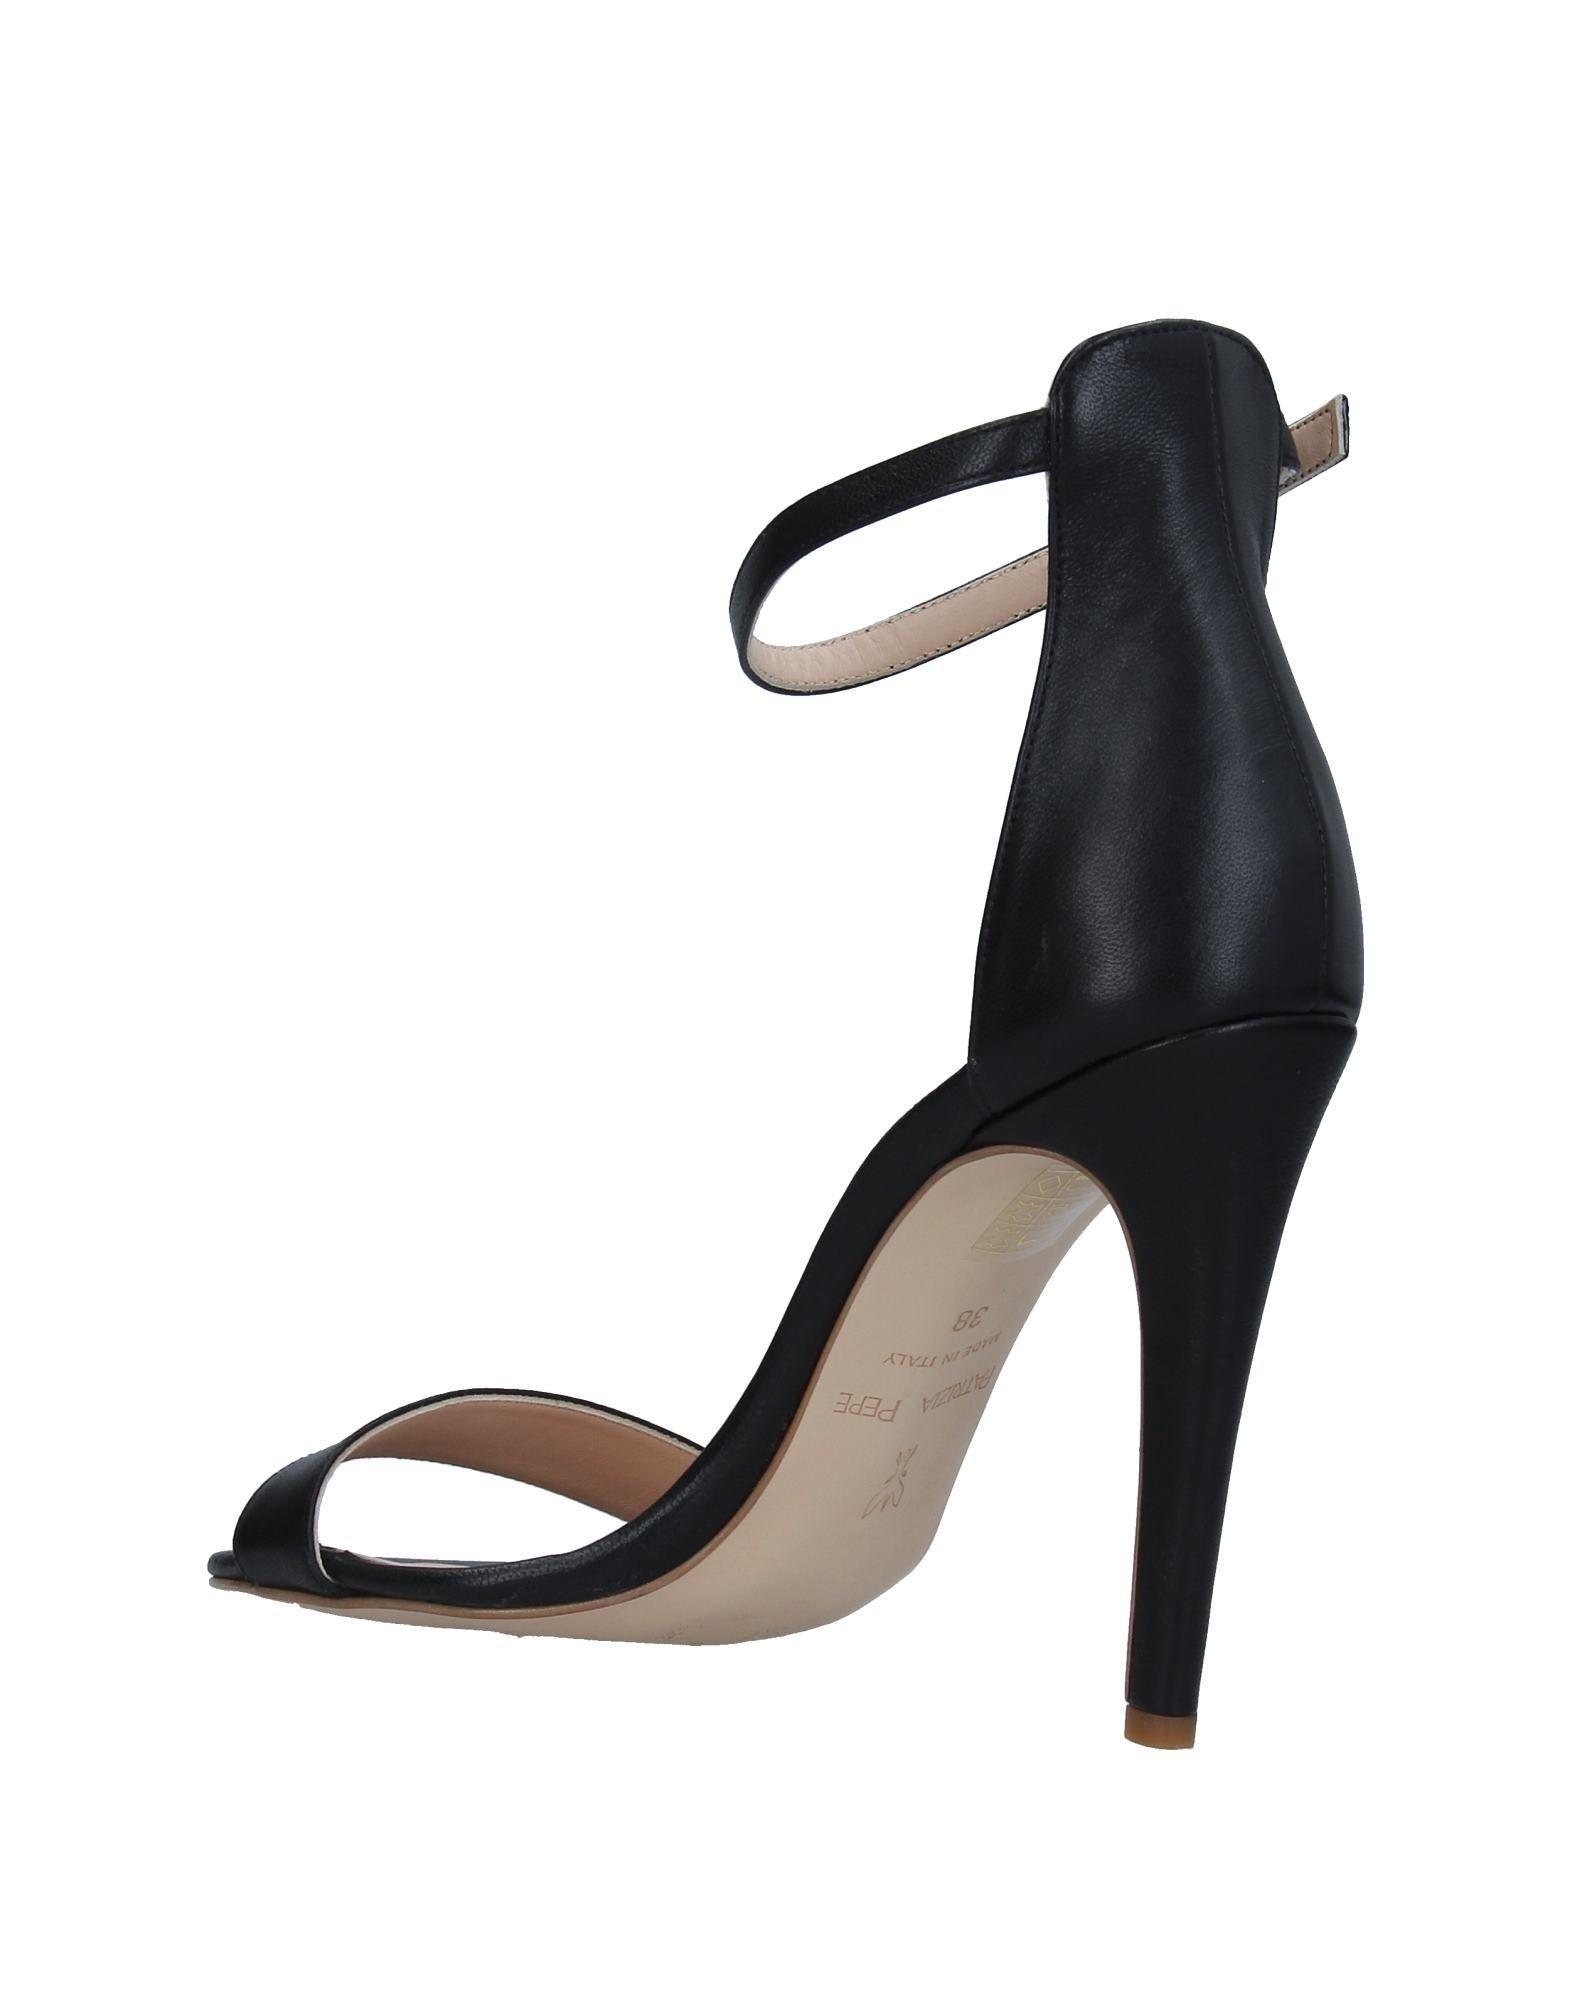 Patrizia Pepe Black Leather Heels